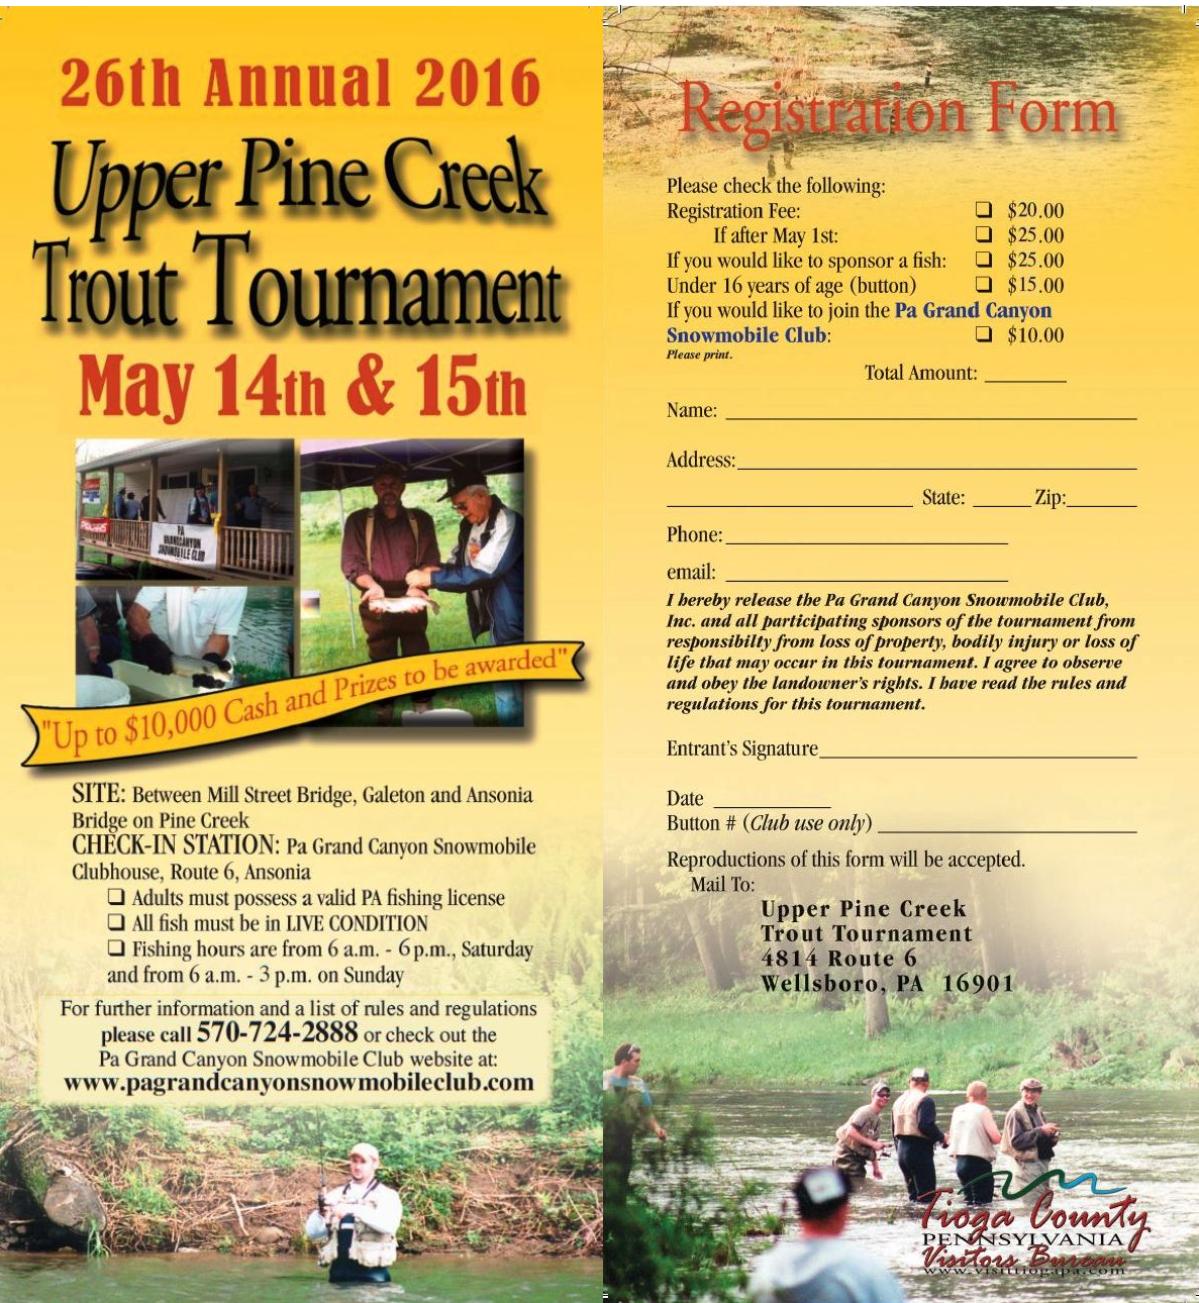 Upper Pine Creek Trout Tournament